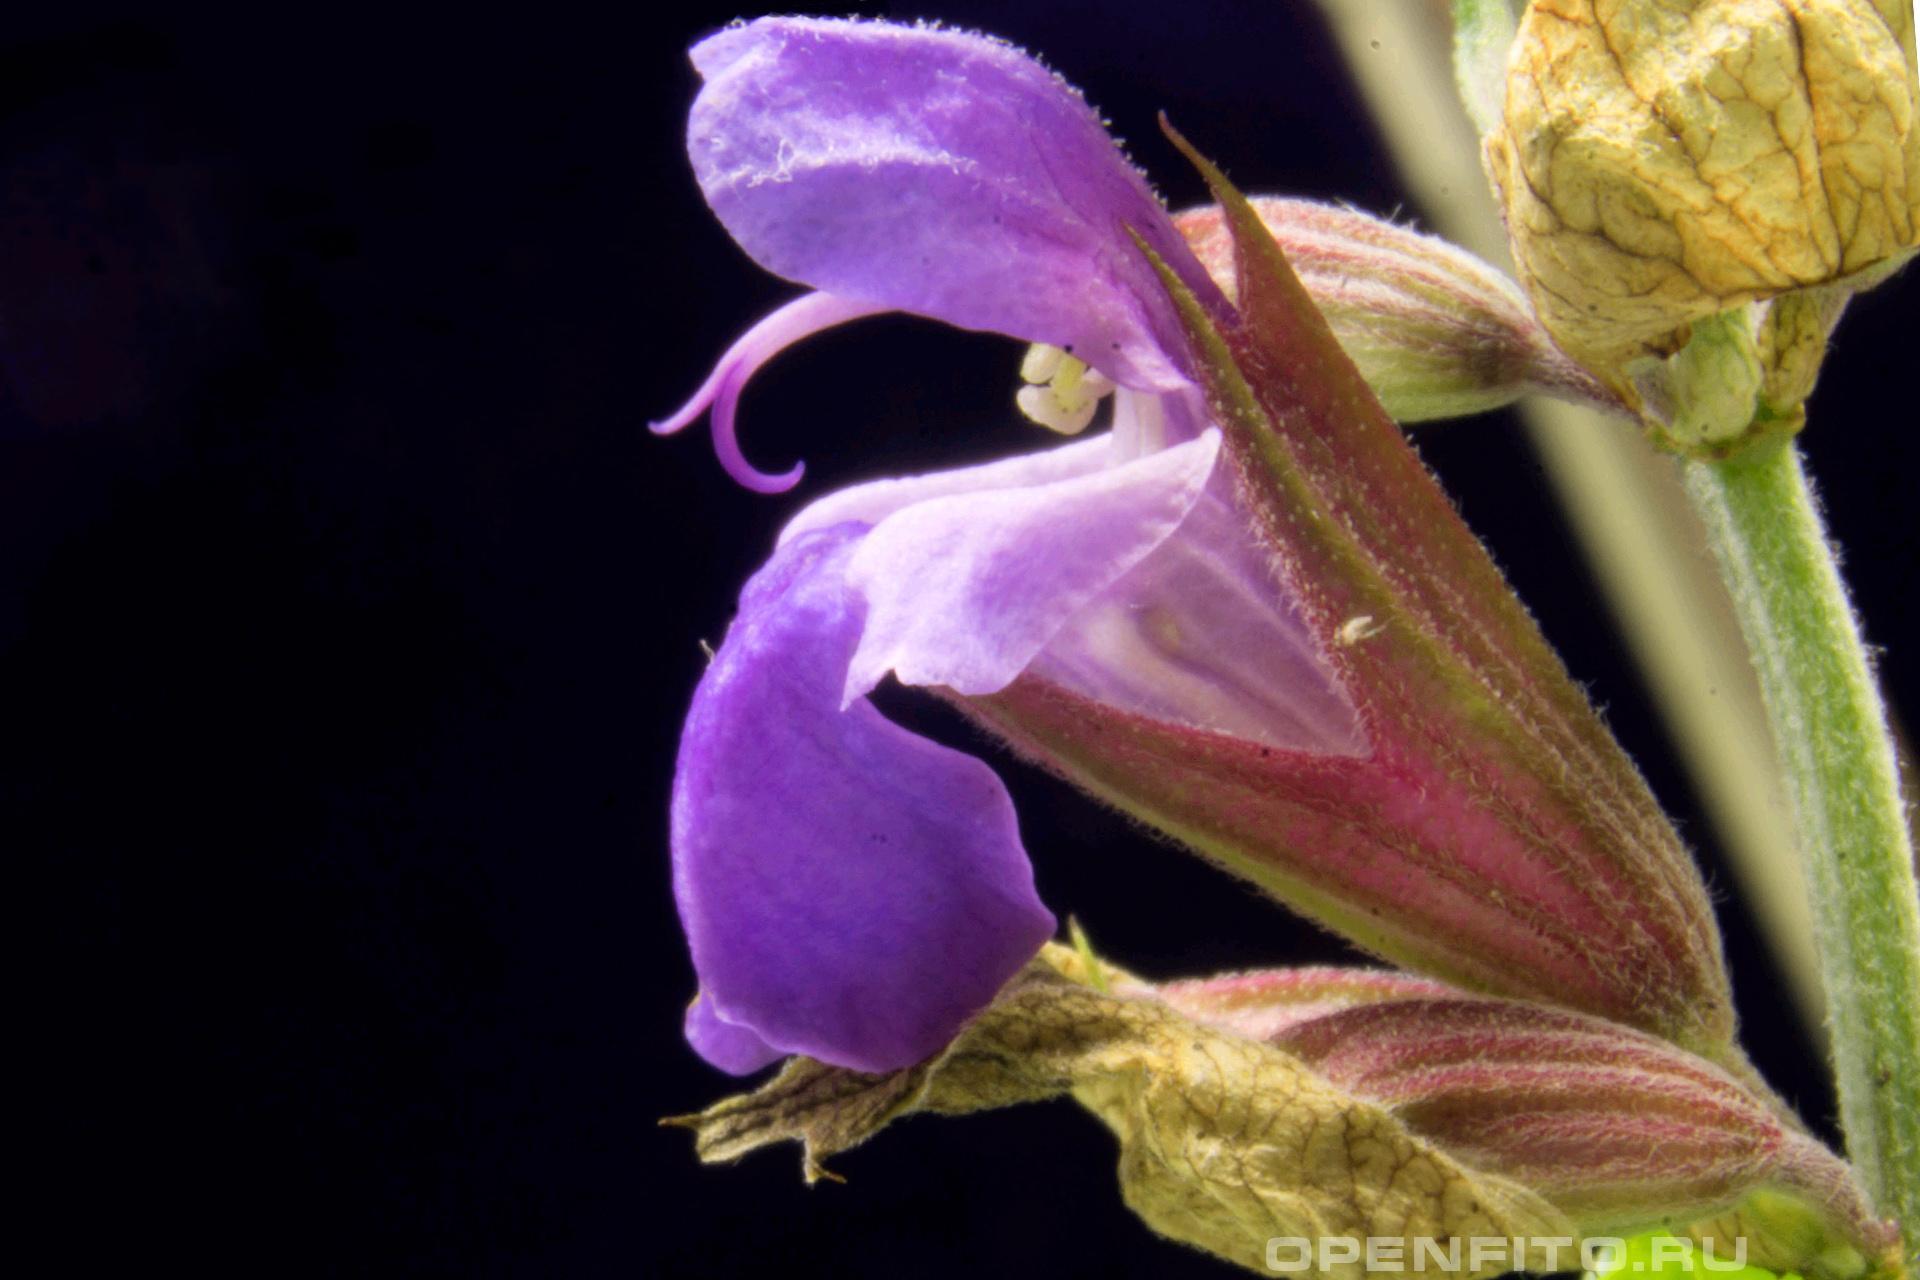 Шалфей цветок шалфея лекарственного